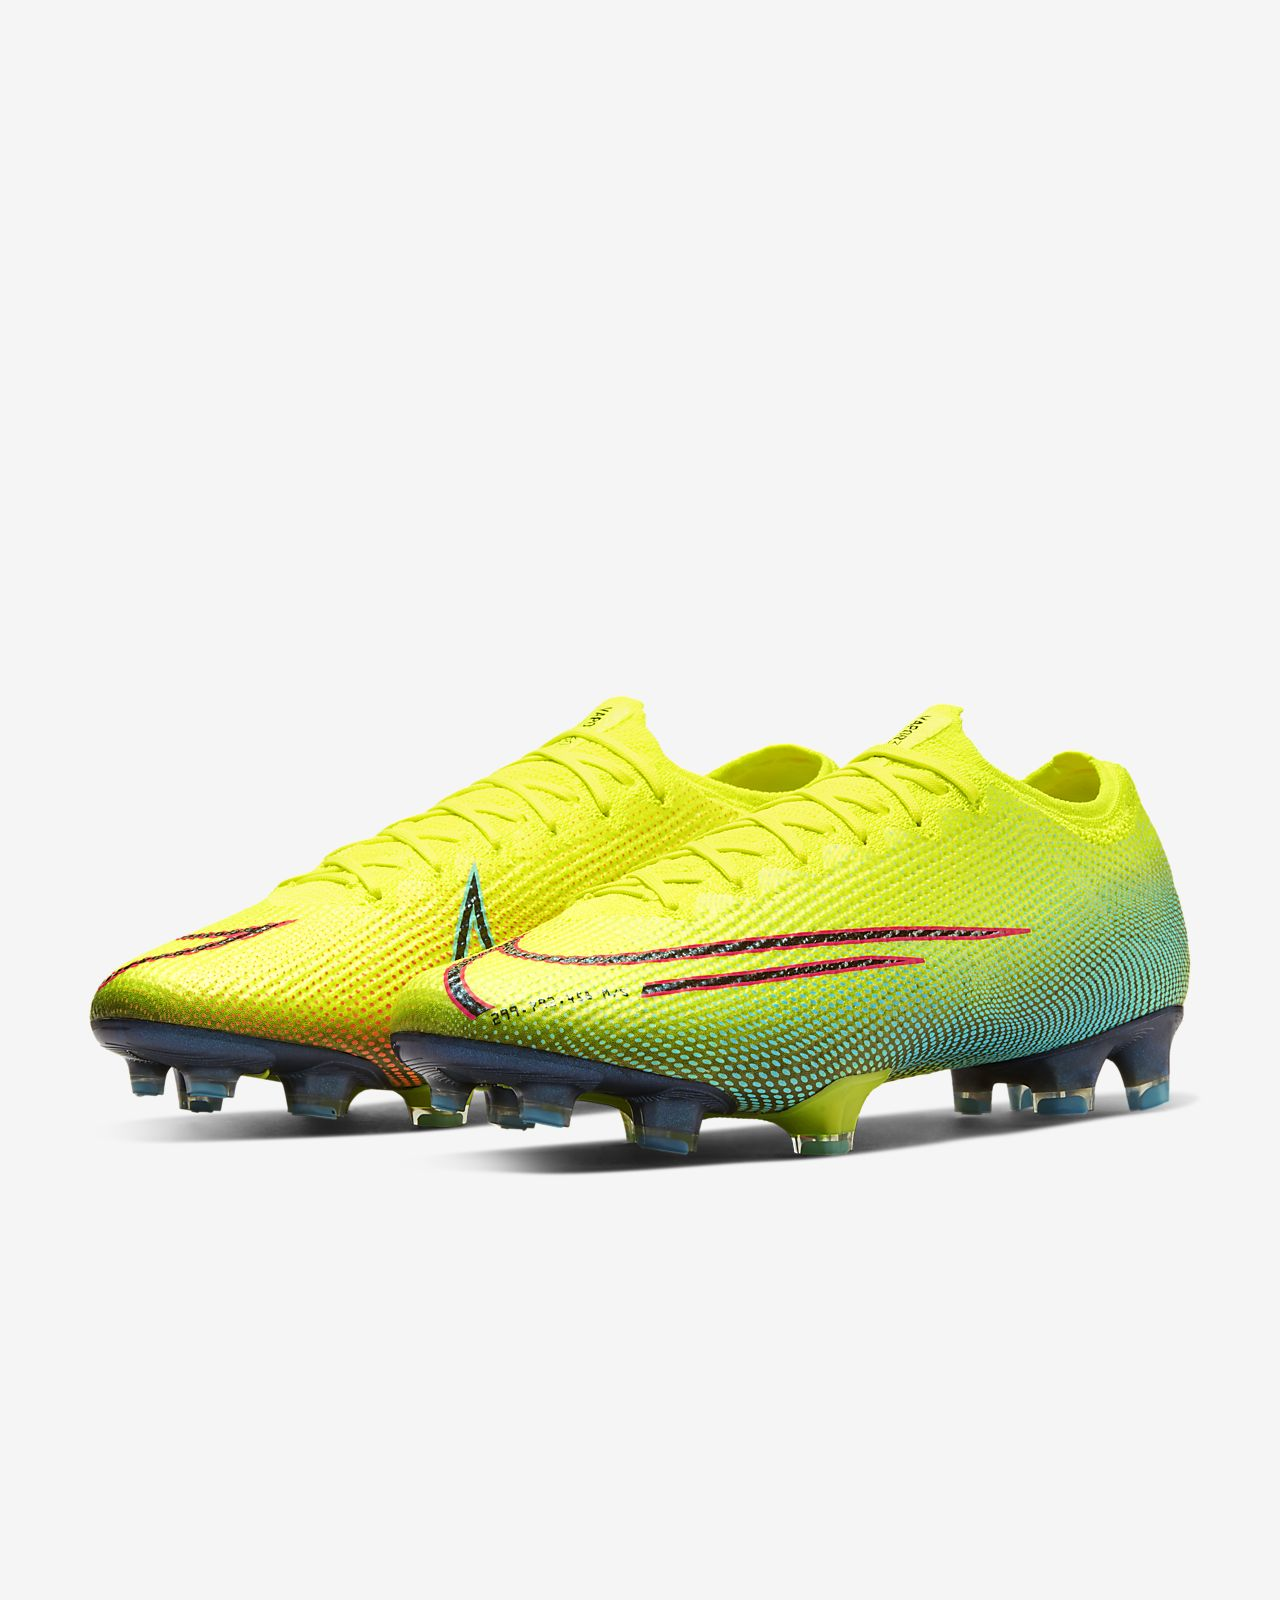 Nike Mercurial Vapor 13 Elite MDS FG Firm Ground Football Boot